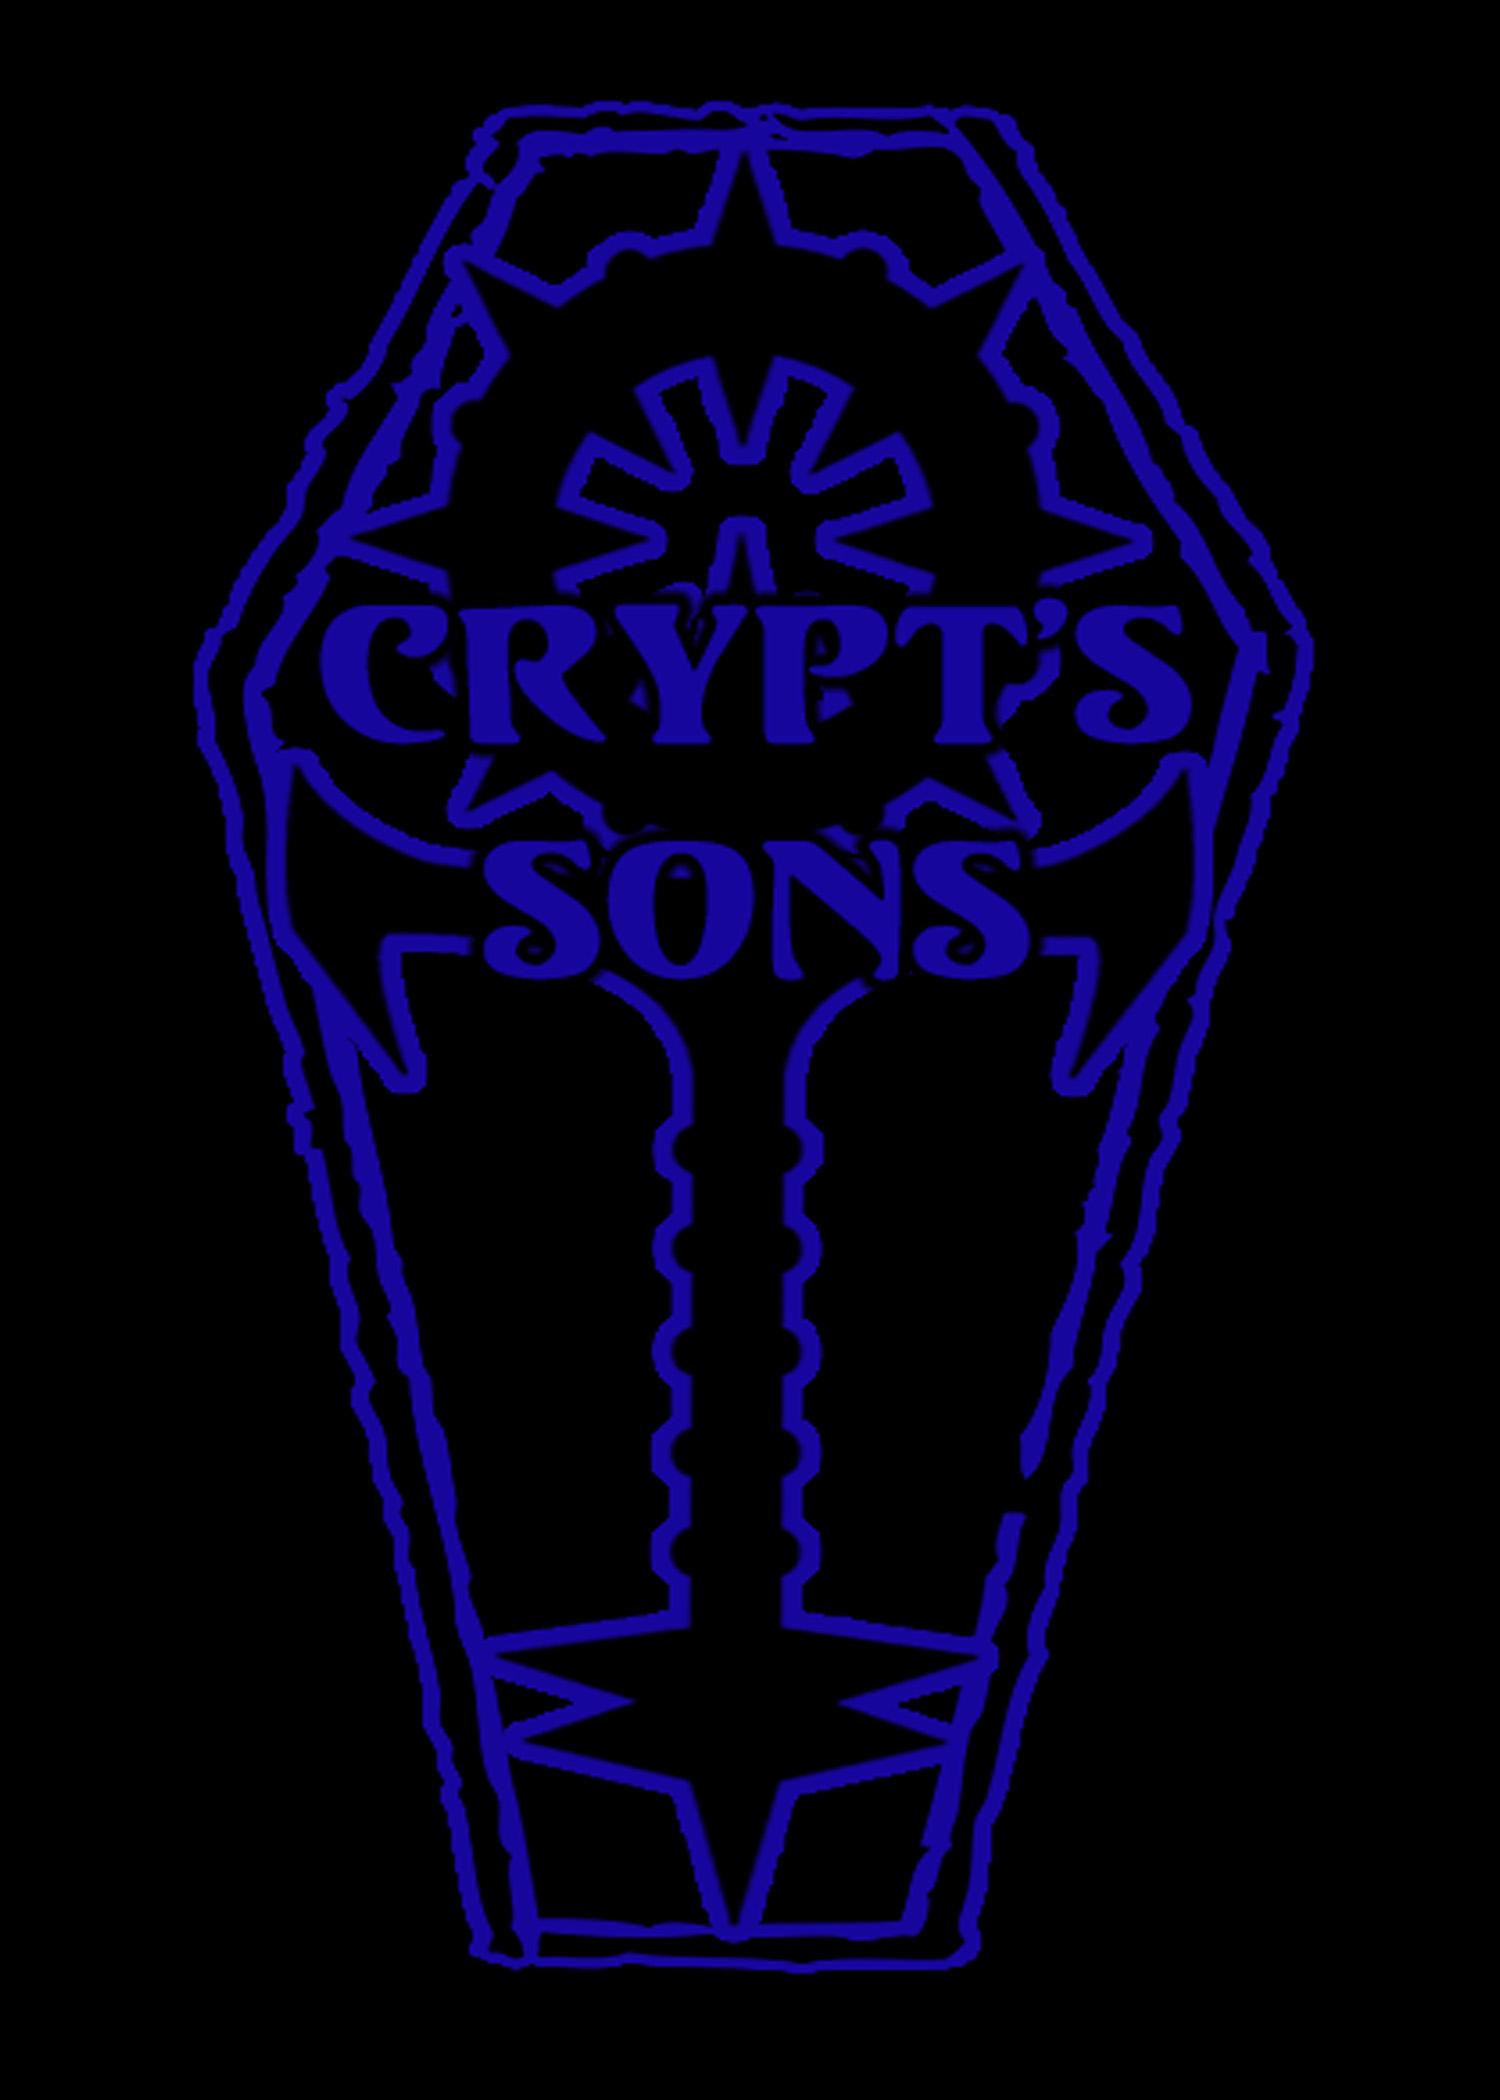 Cryptsons.jpg